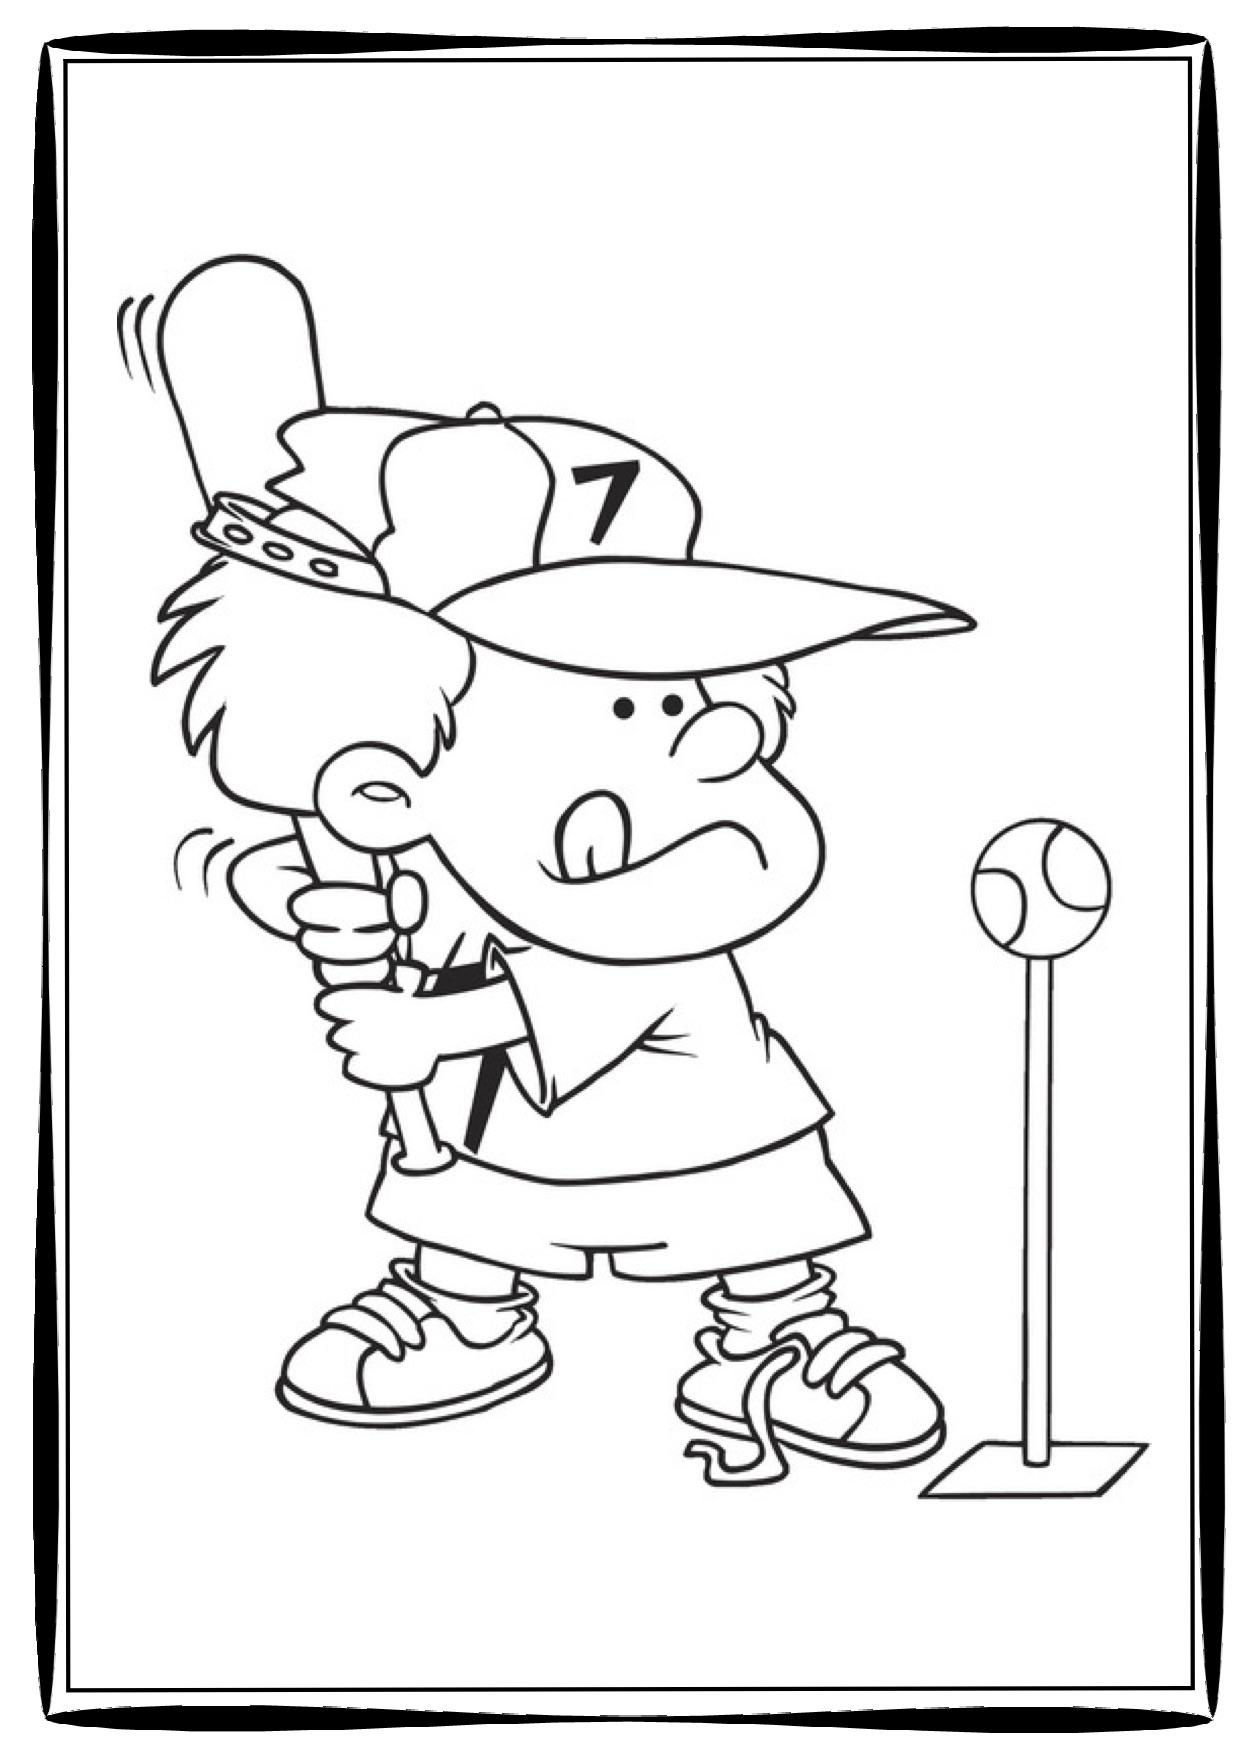 Baseball Batter Coloring Pages At Getdrawings